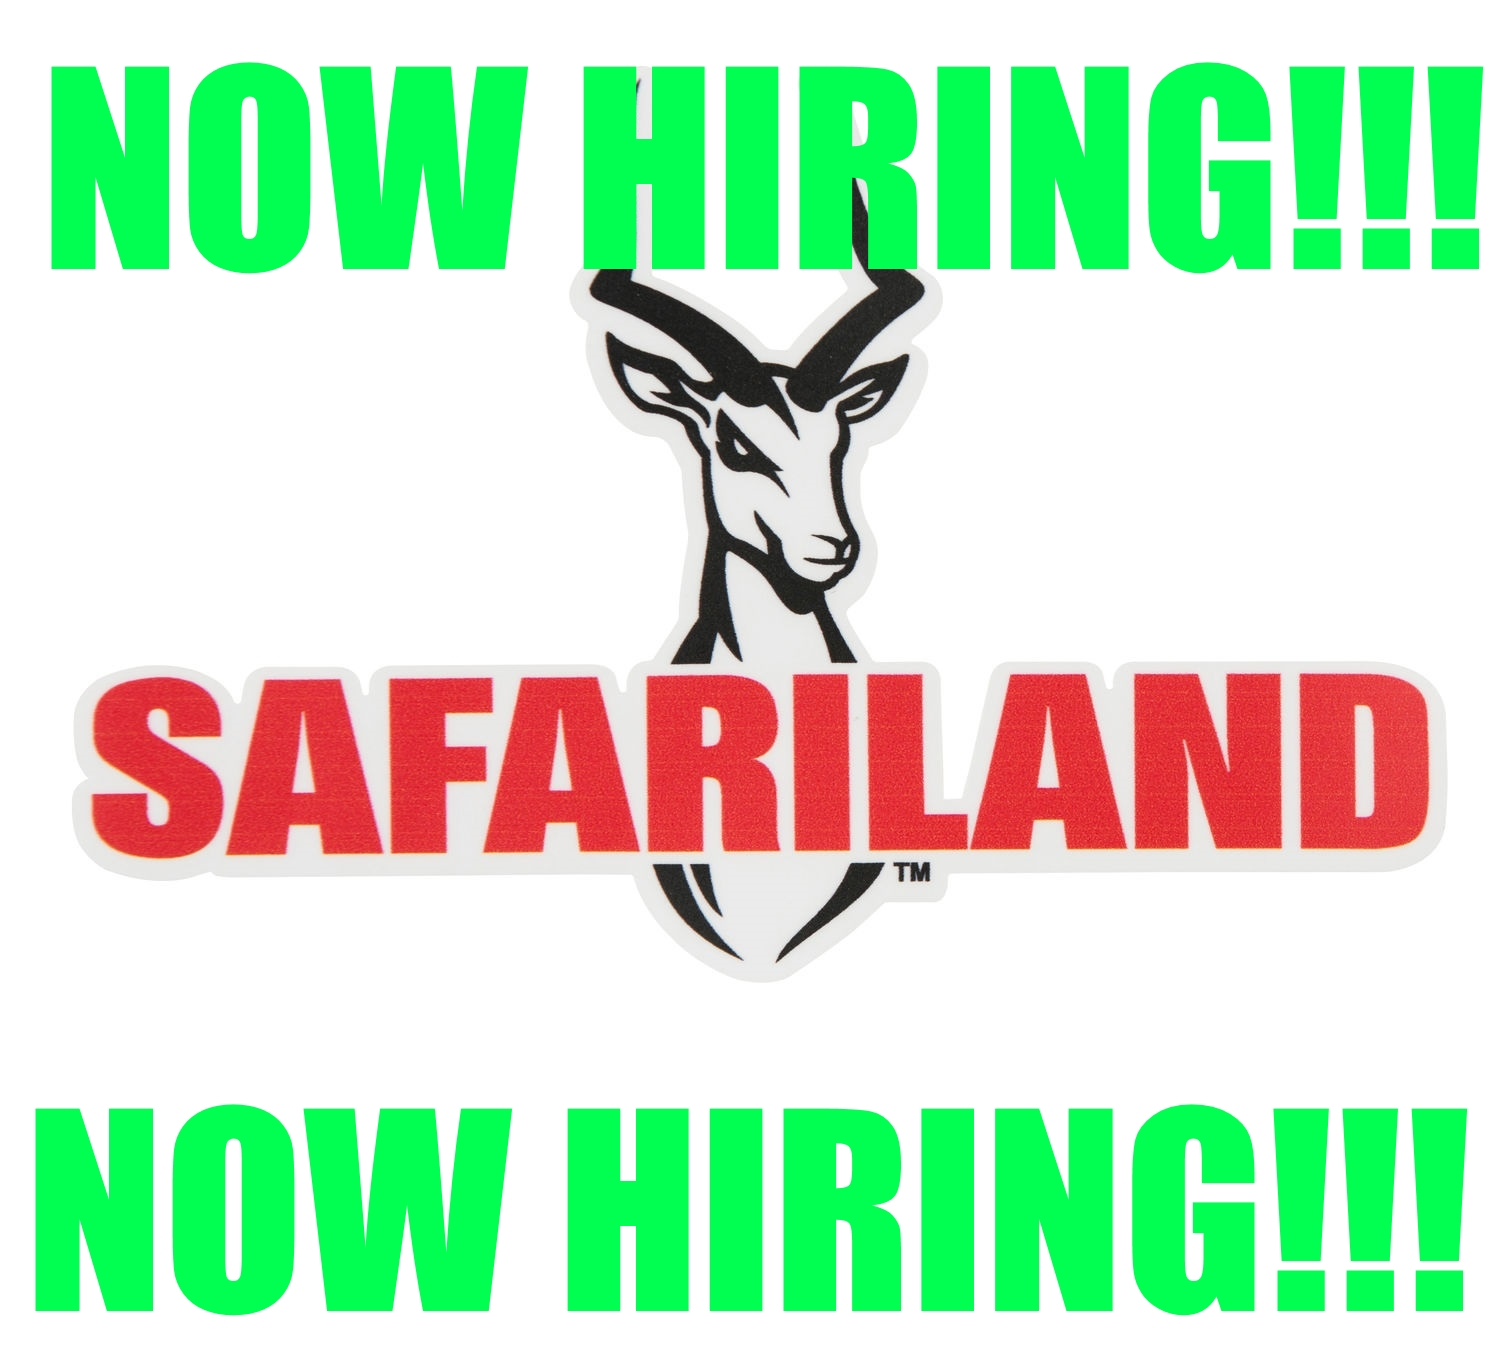 SAFARILAND: NOW HIRING!!!